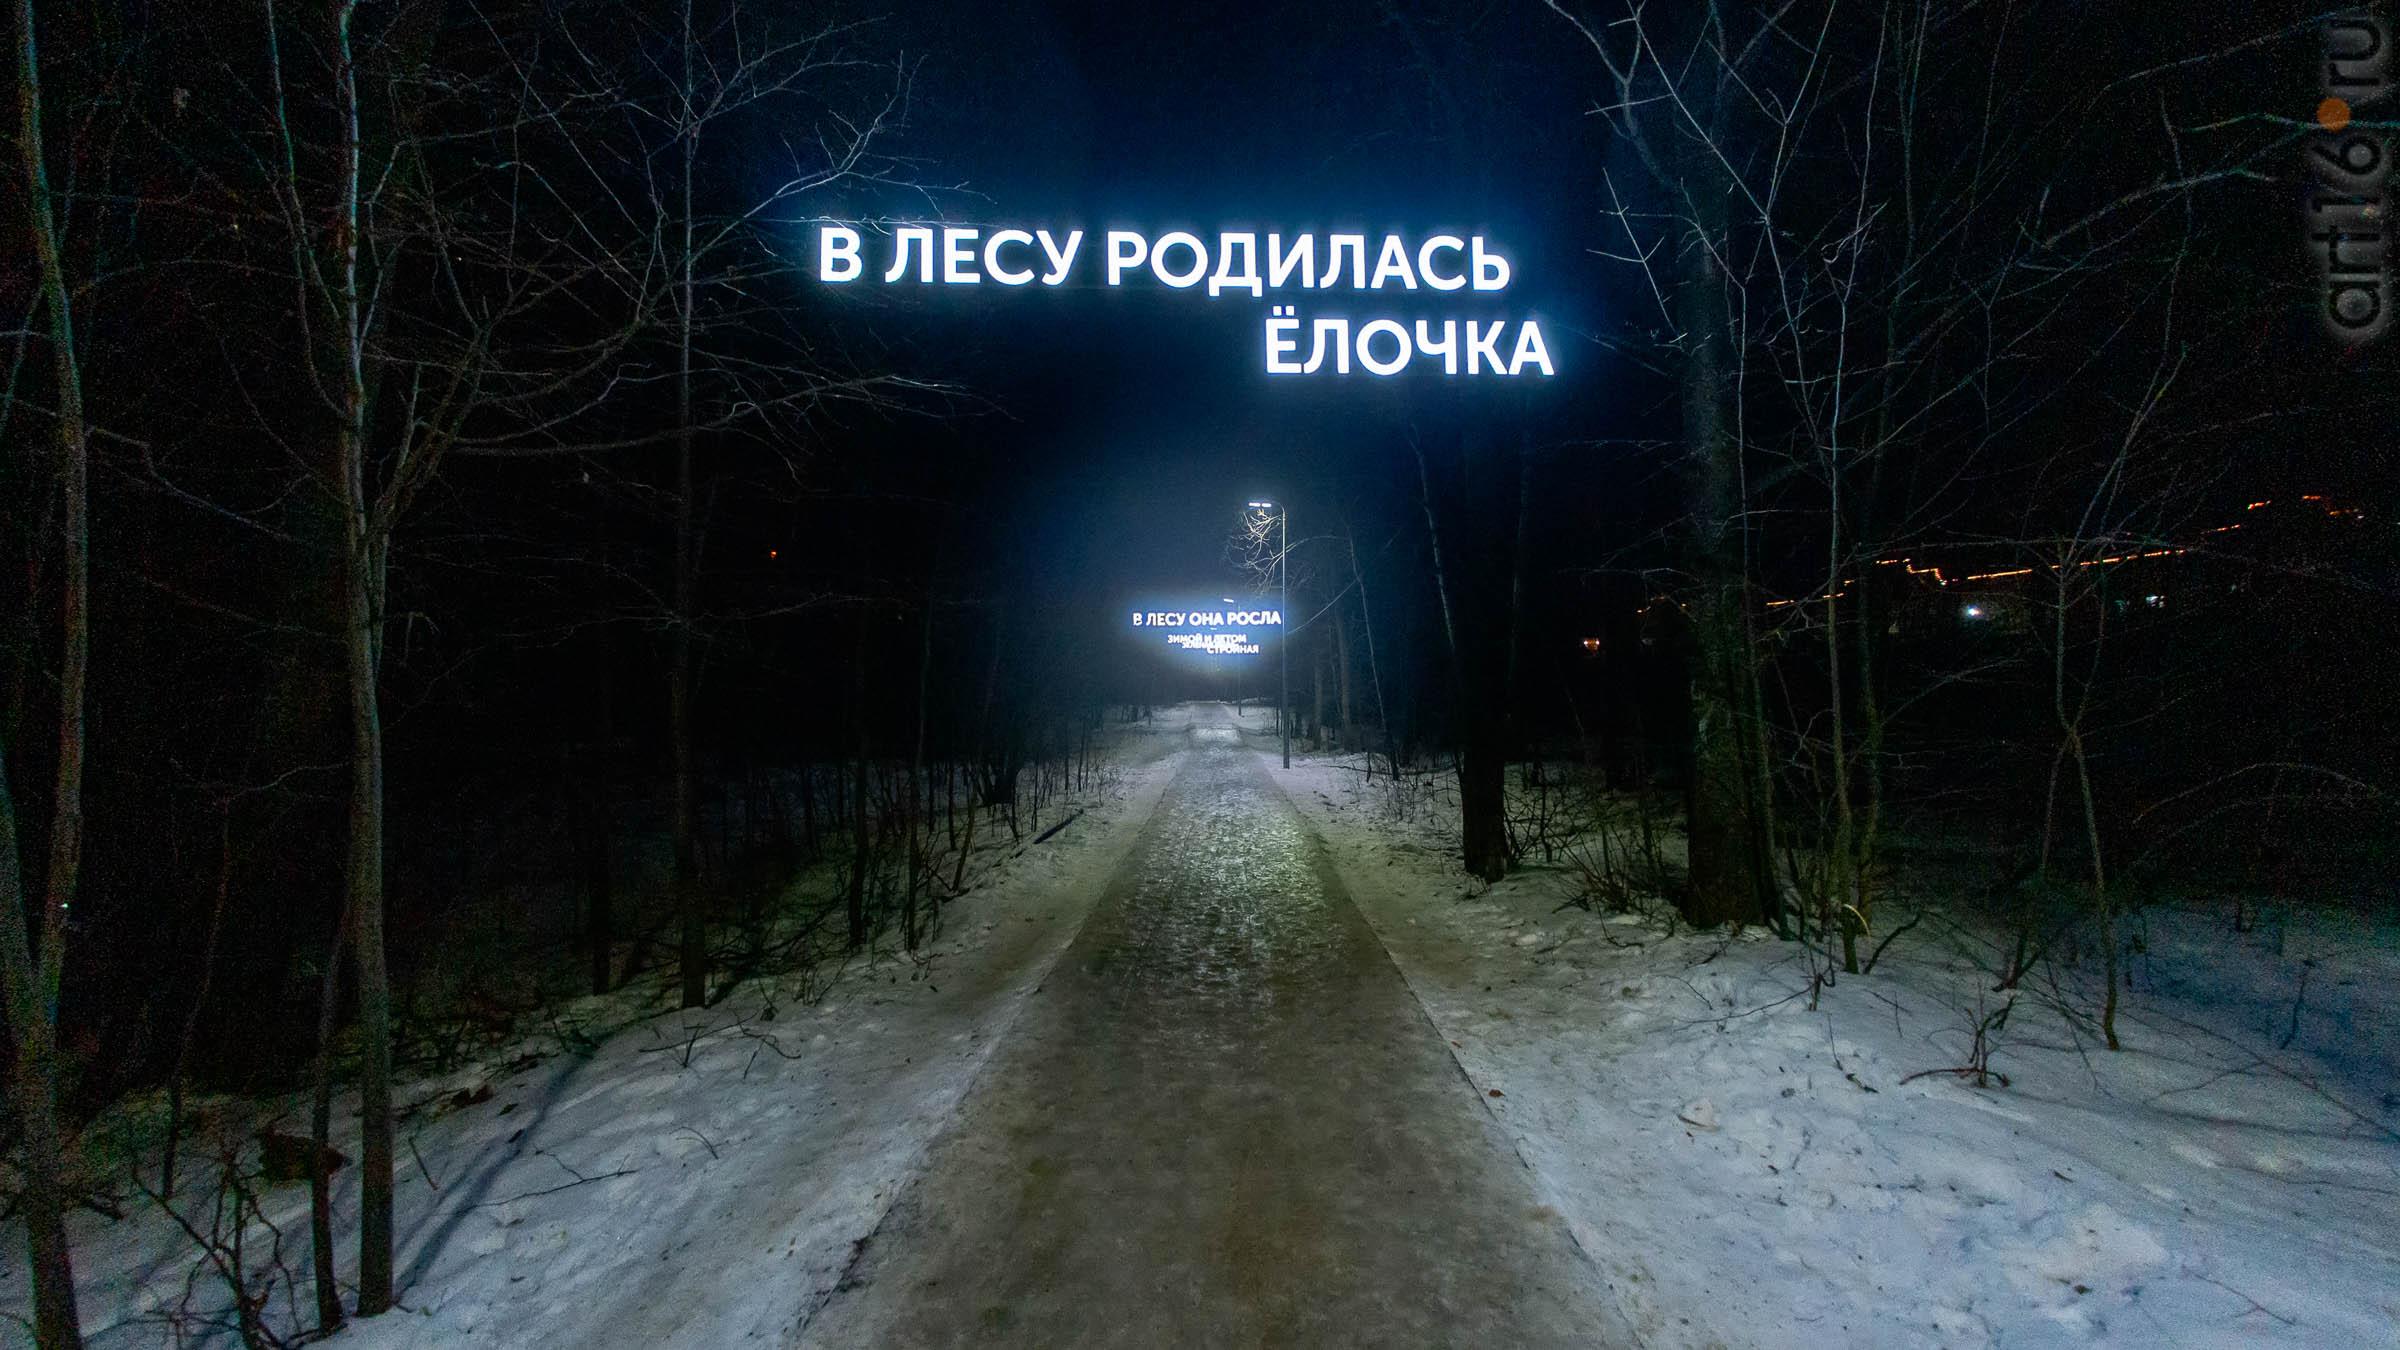 ::Предновогодние снимки. Казань — 2019